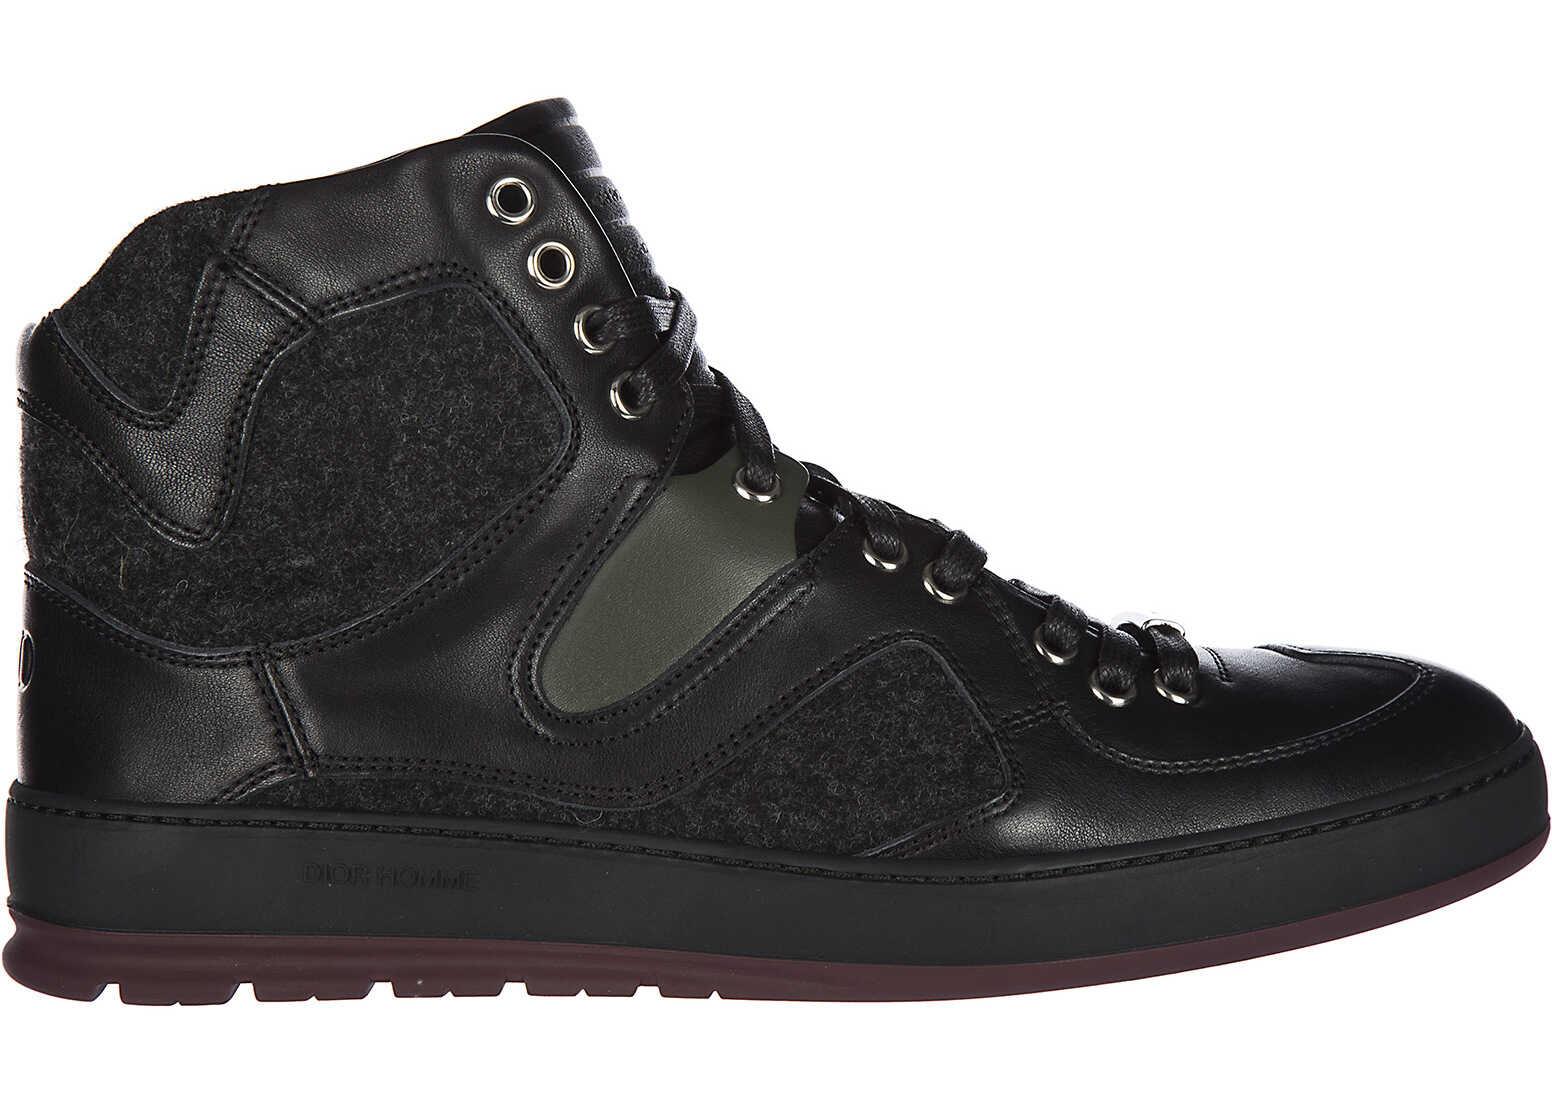 Dior High Top Sneakers B19 Black